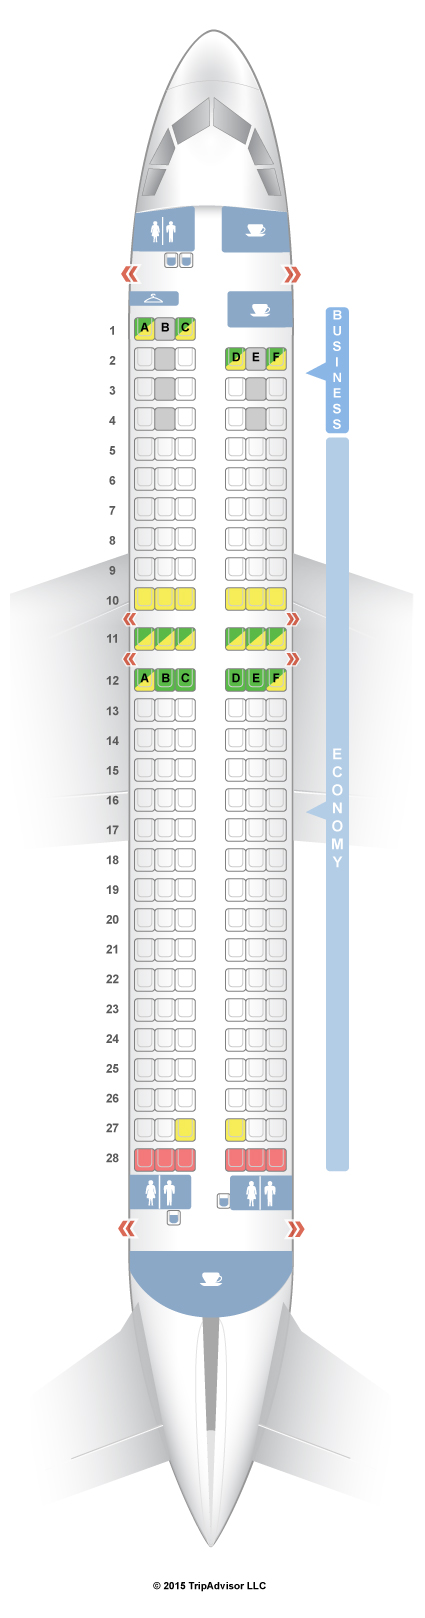 Airbus A320 Seat Map SeatGuru Seat Map Finnair